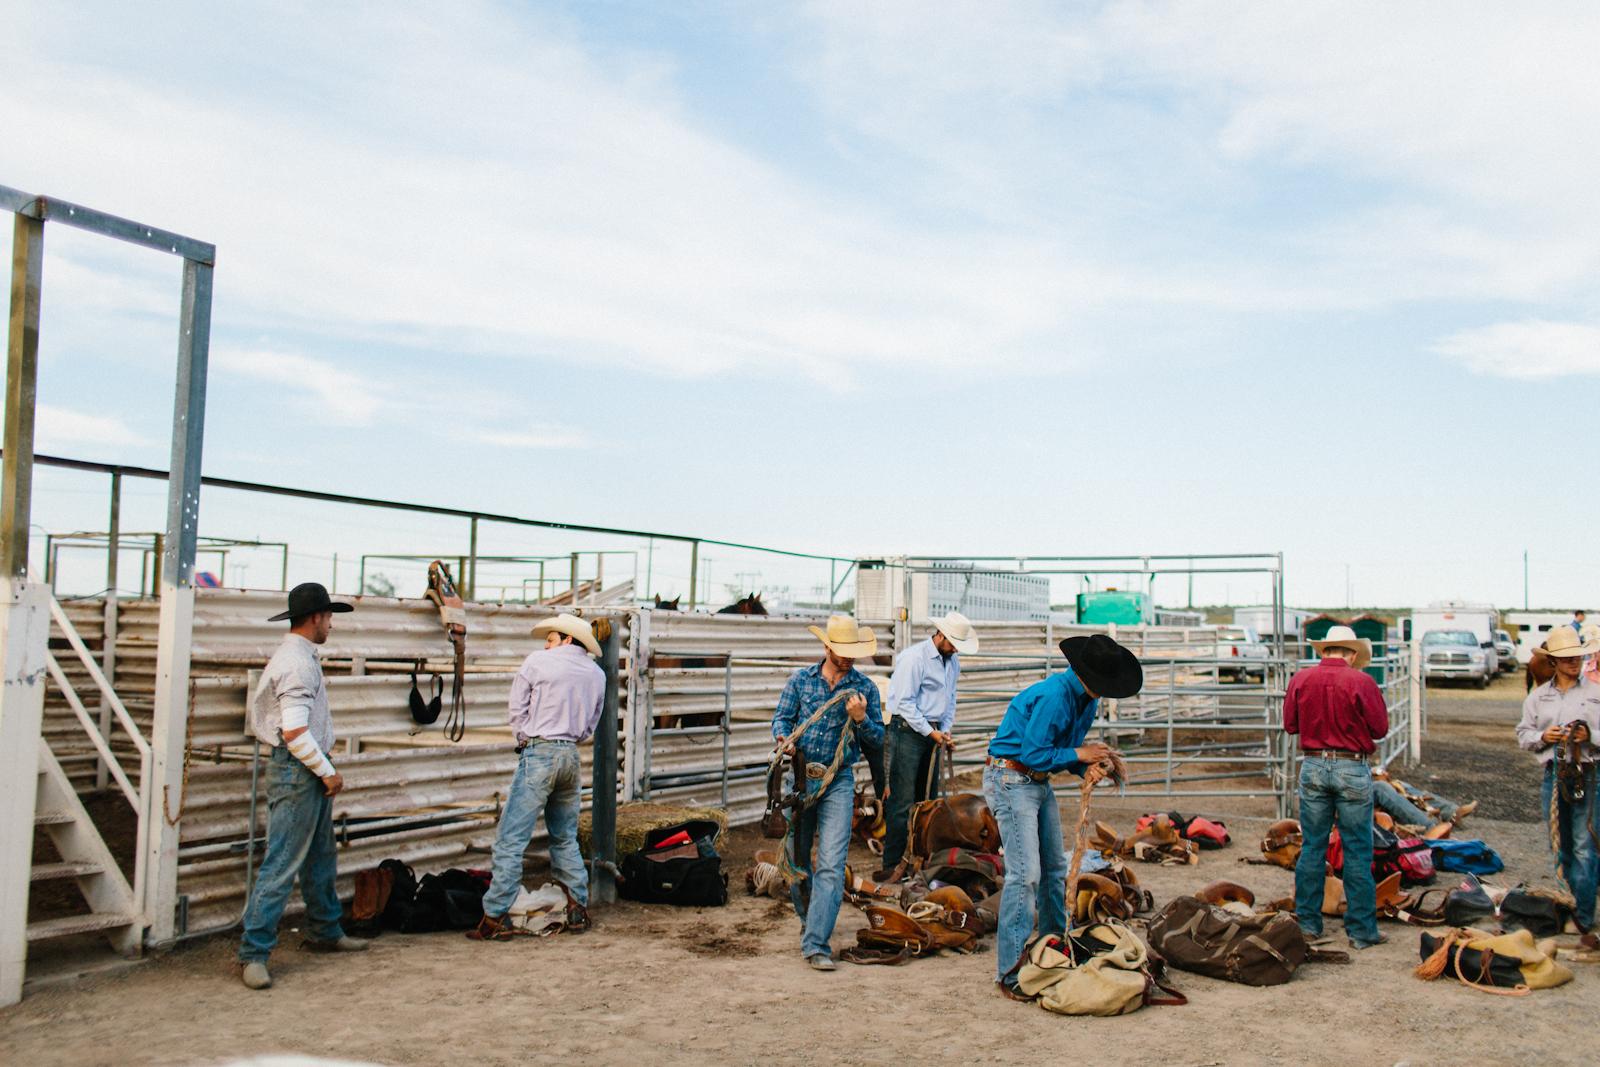 rodeo-7.jpg